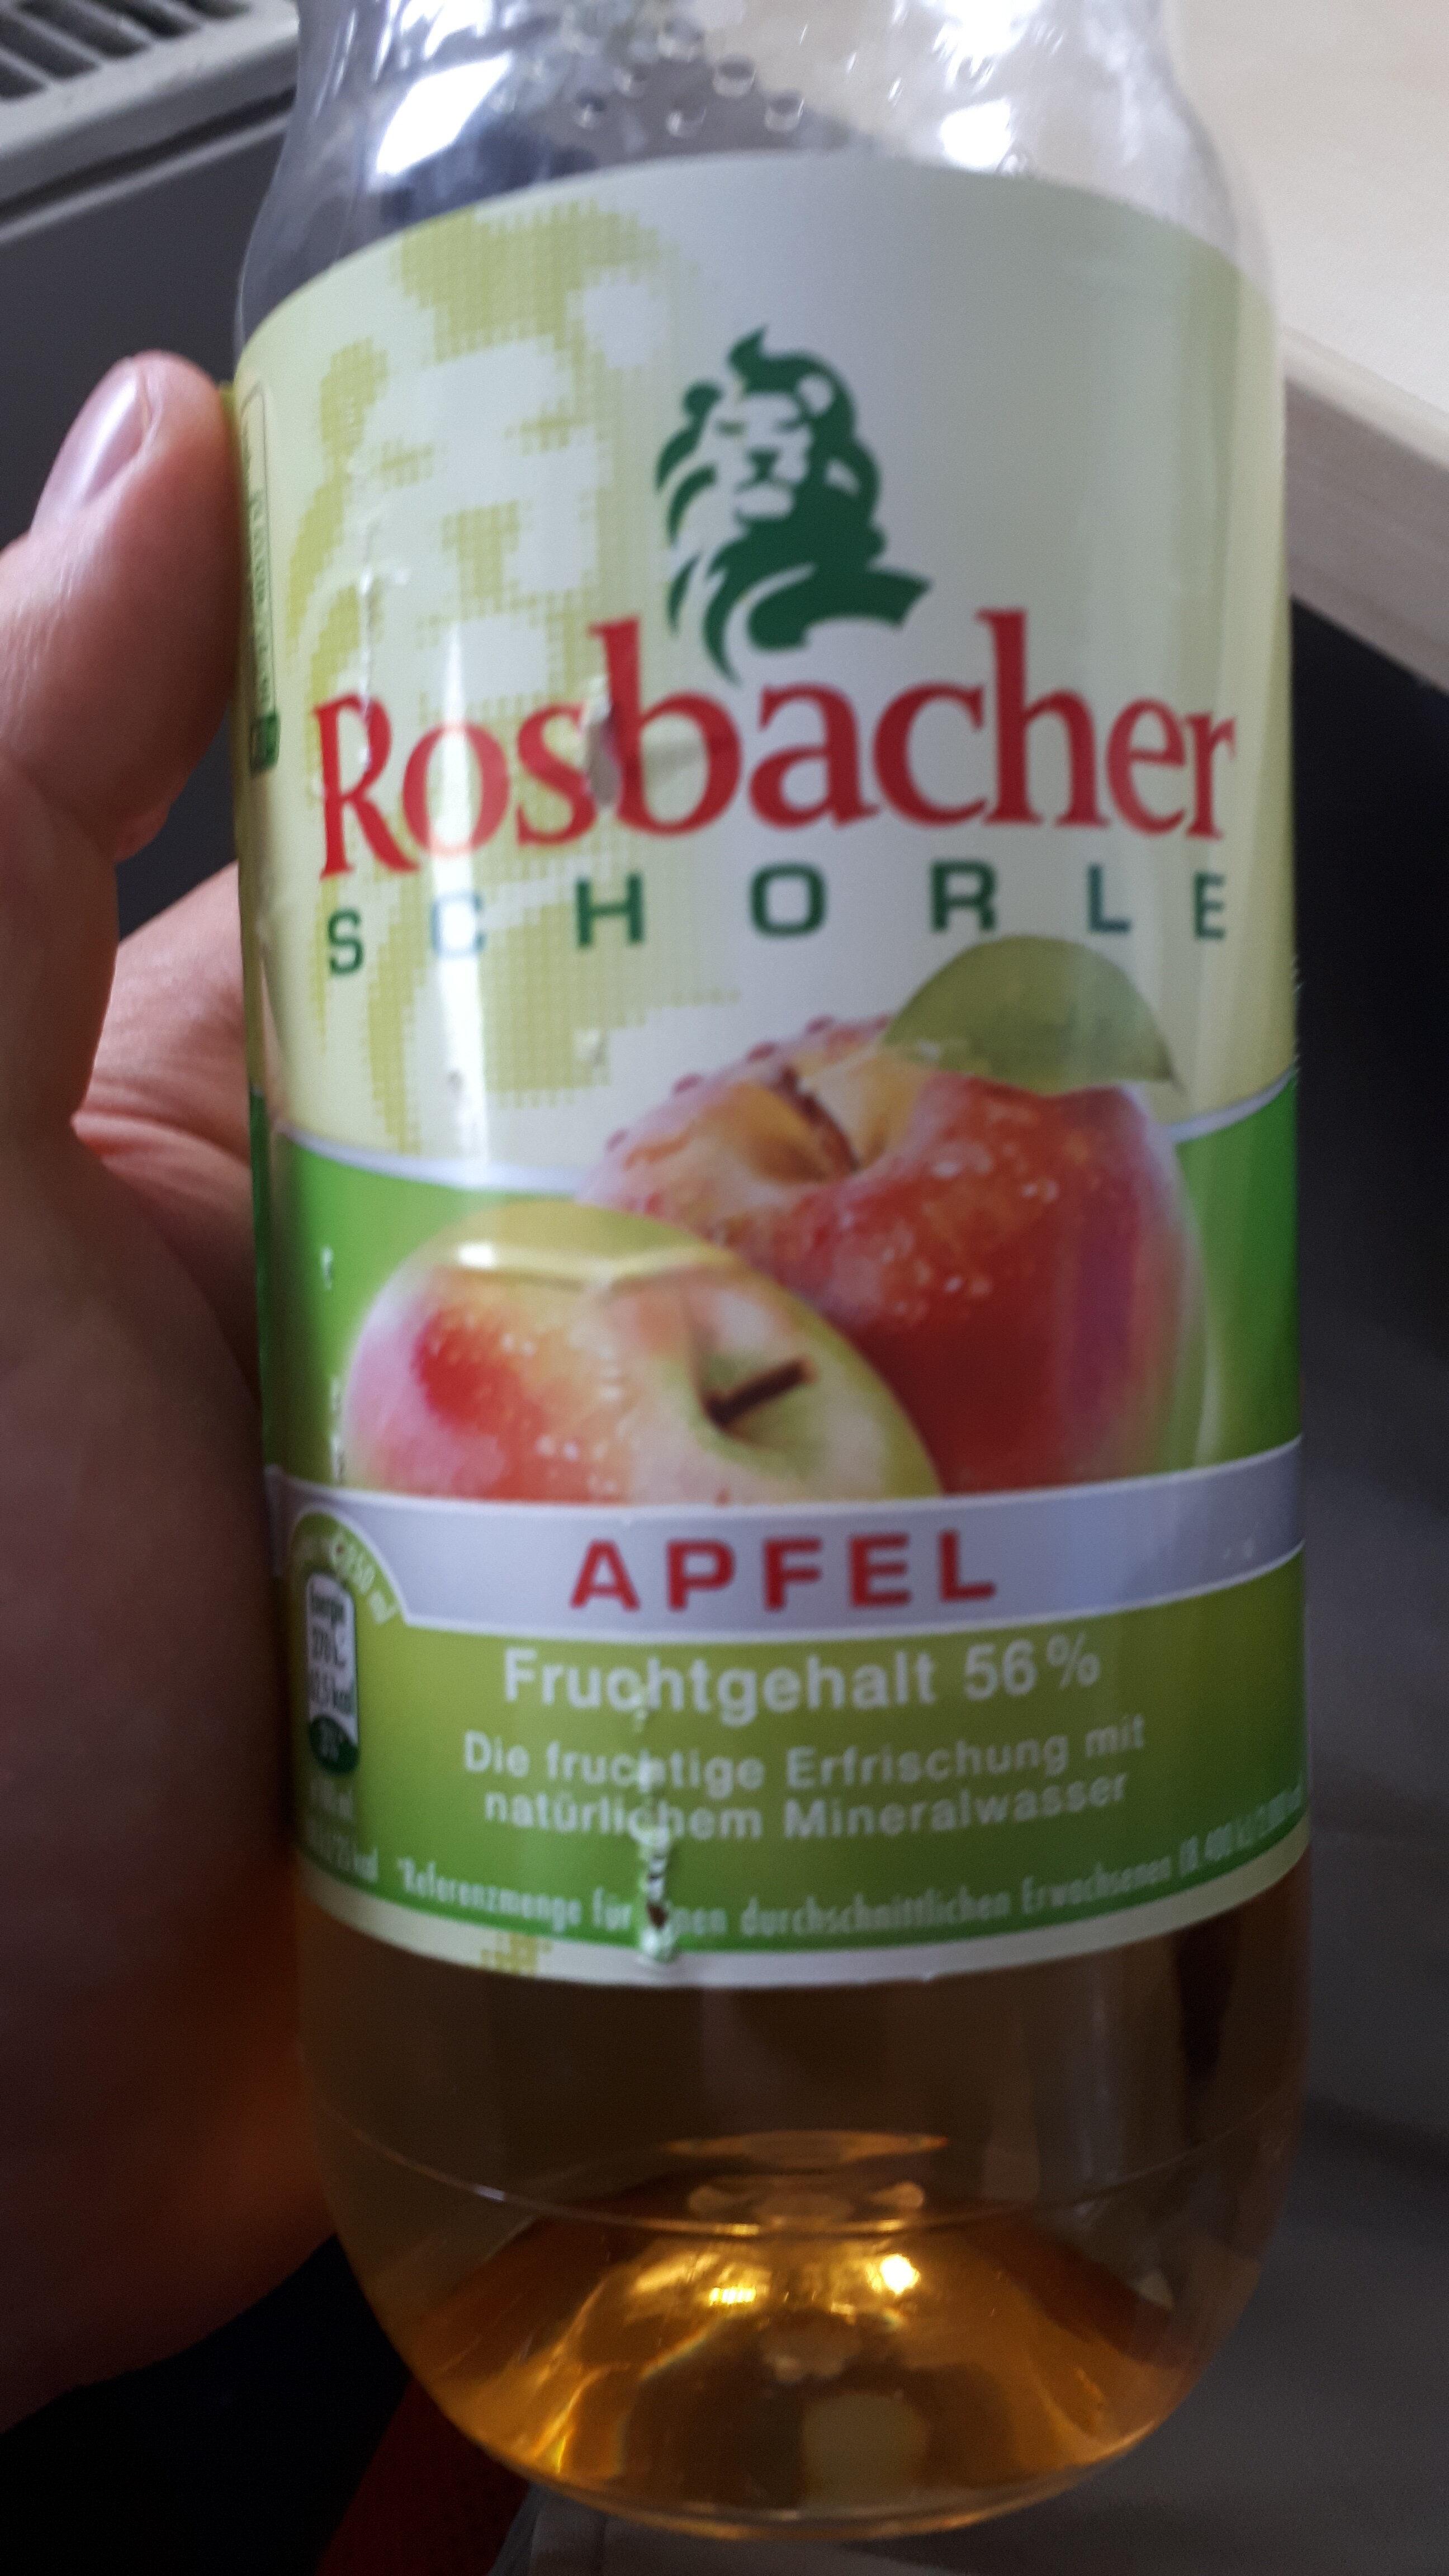 Rosbacher Schorle Apfel - Product